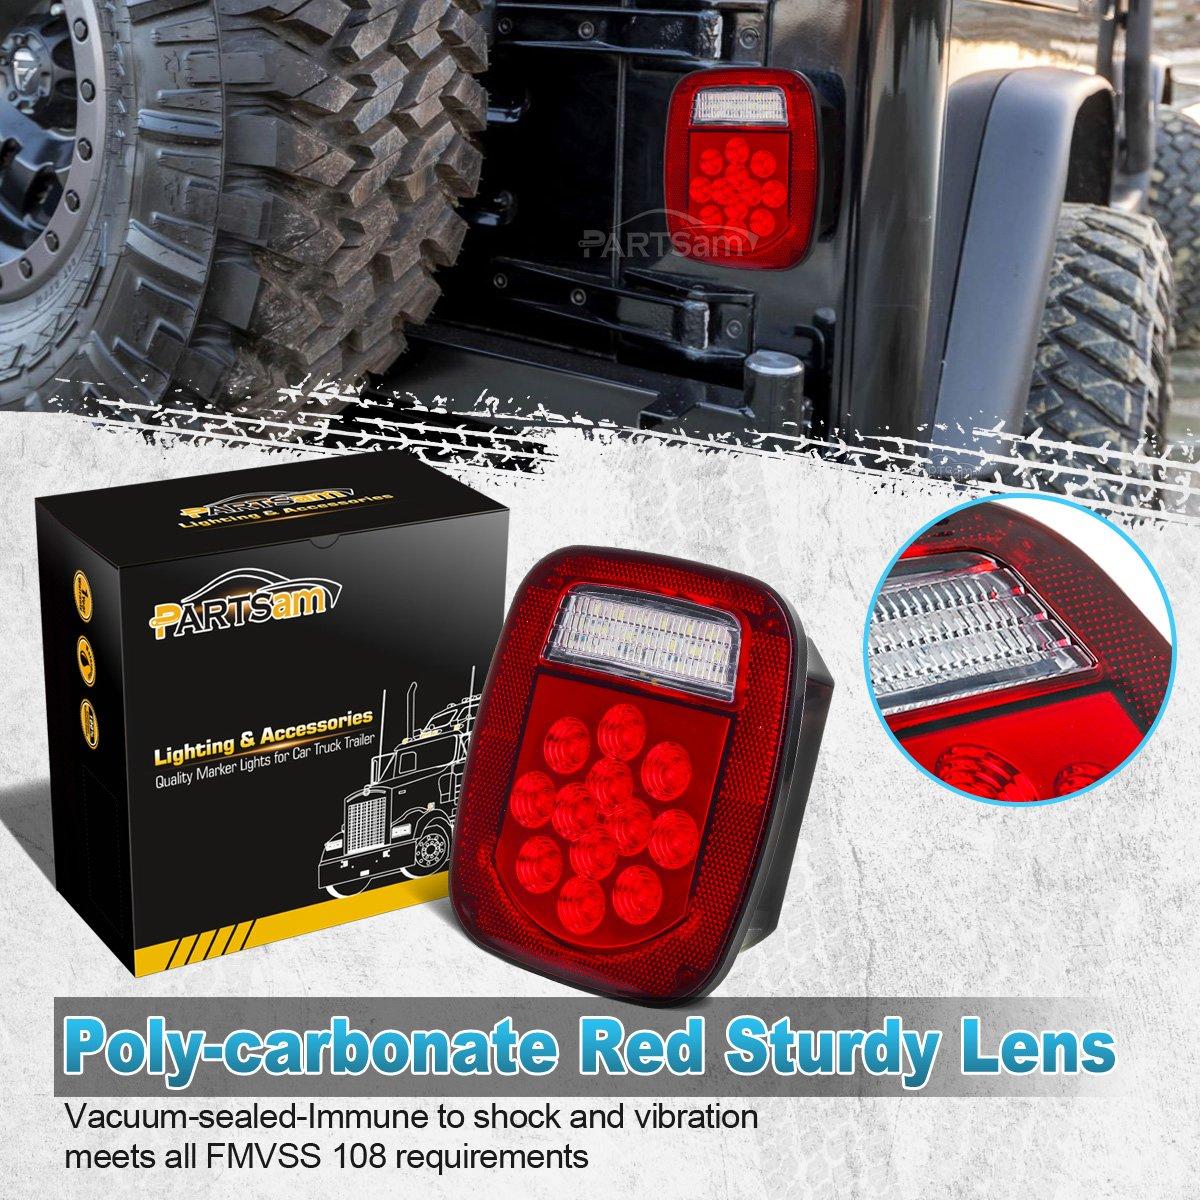 Amazoncom Partsam 2x RedWhite 39 LED Stop Turn Tail Stud Lights